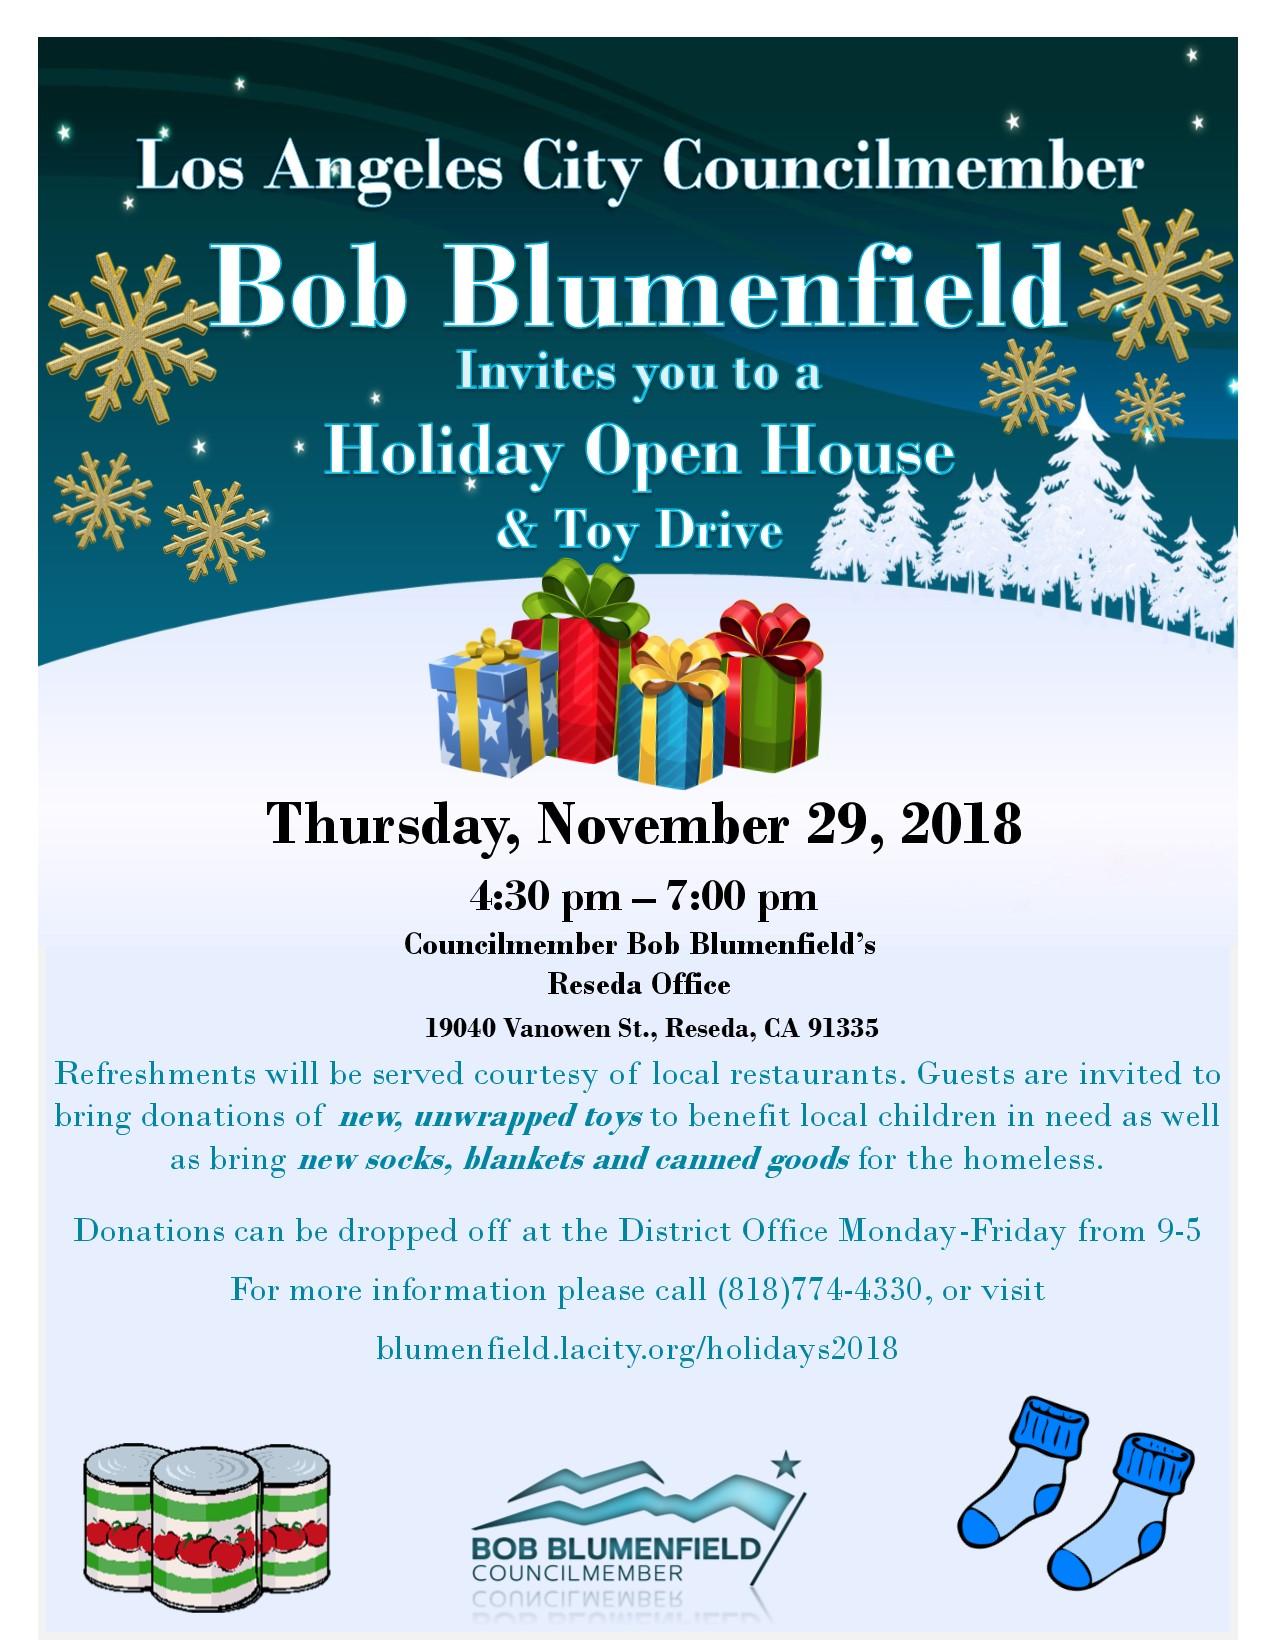 Invitation_Holiday_open_house_2018__(3).jpg